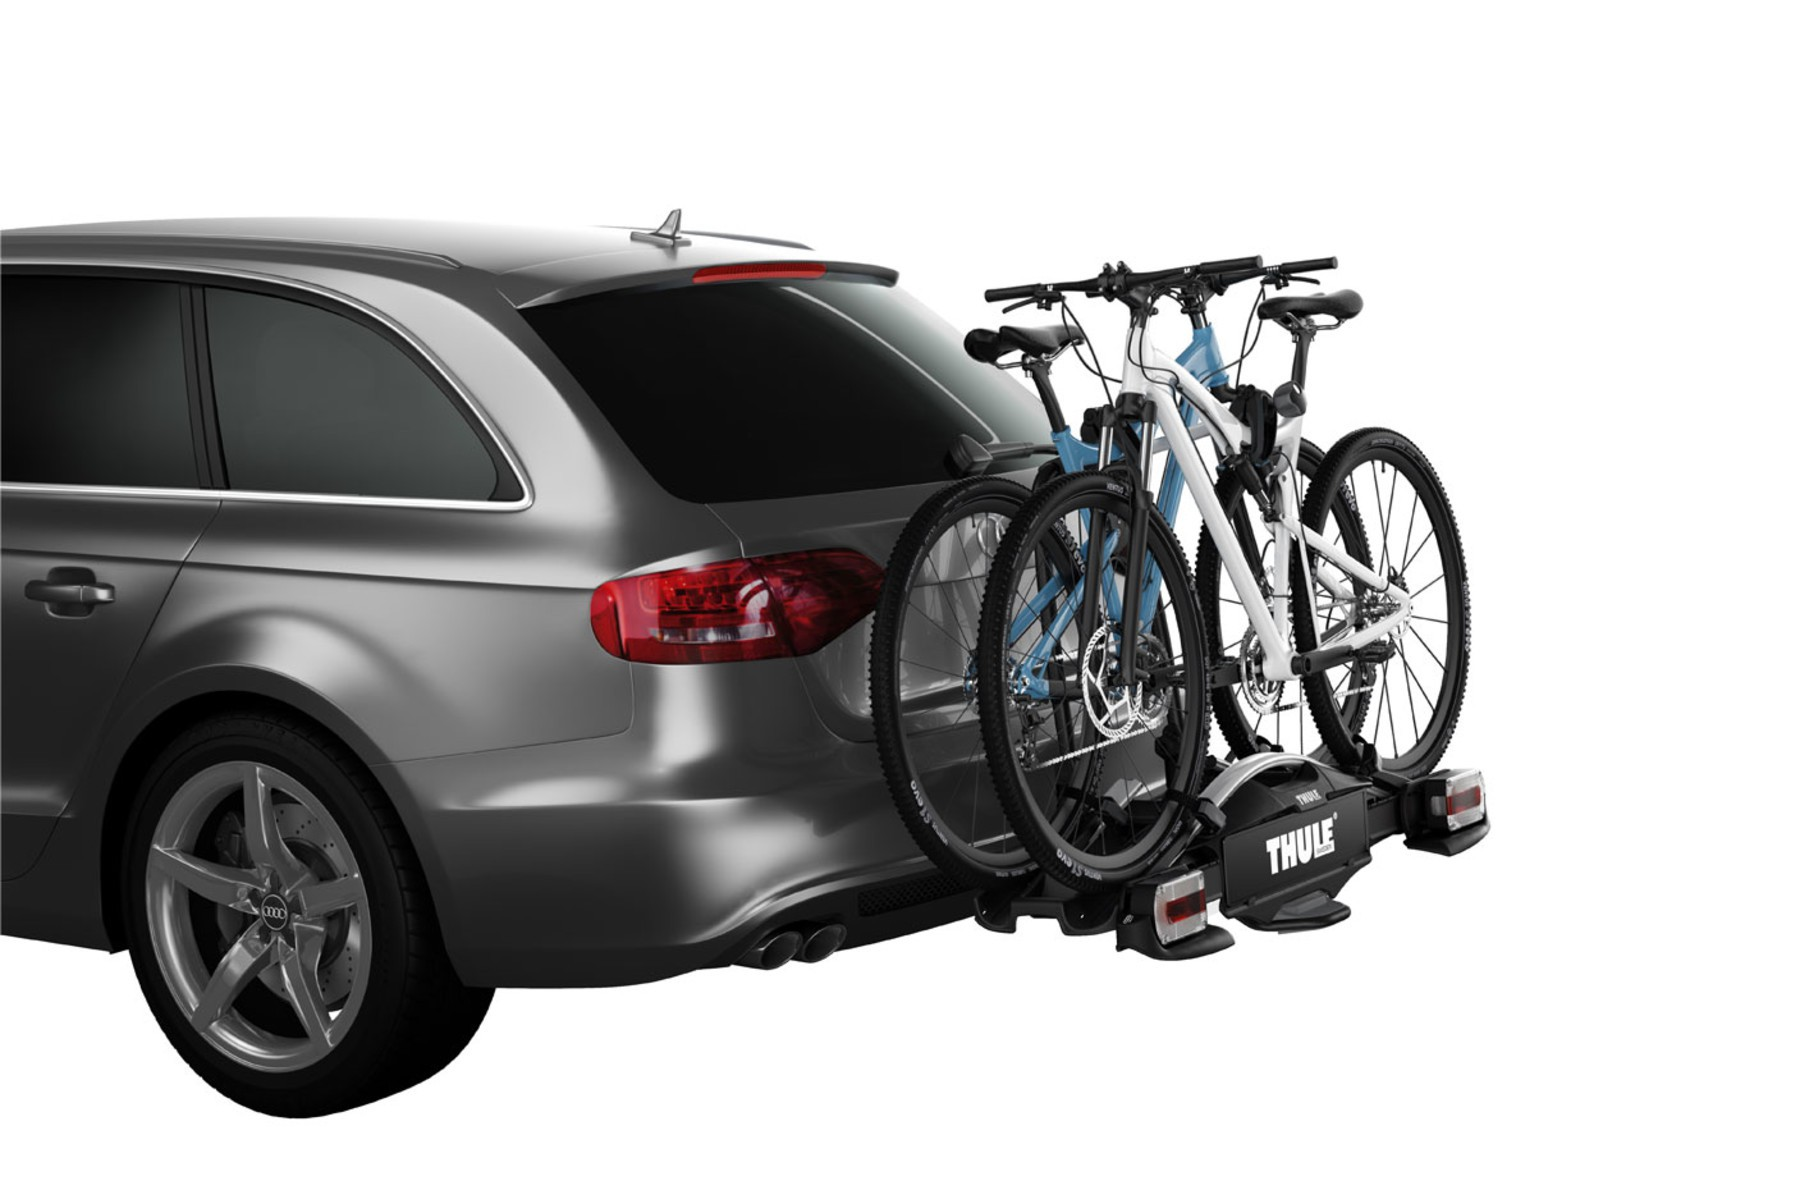 Suporte p/ 2 Bicicleta  THULE VeloCompact p/ Engate  (925)